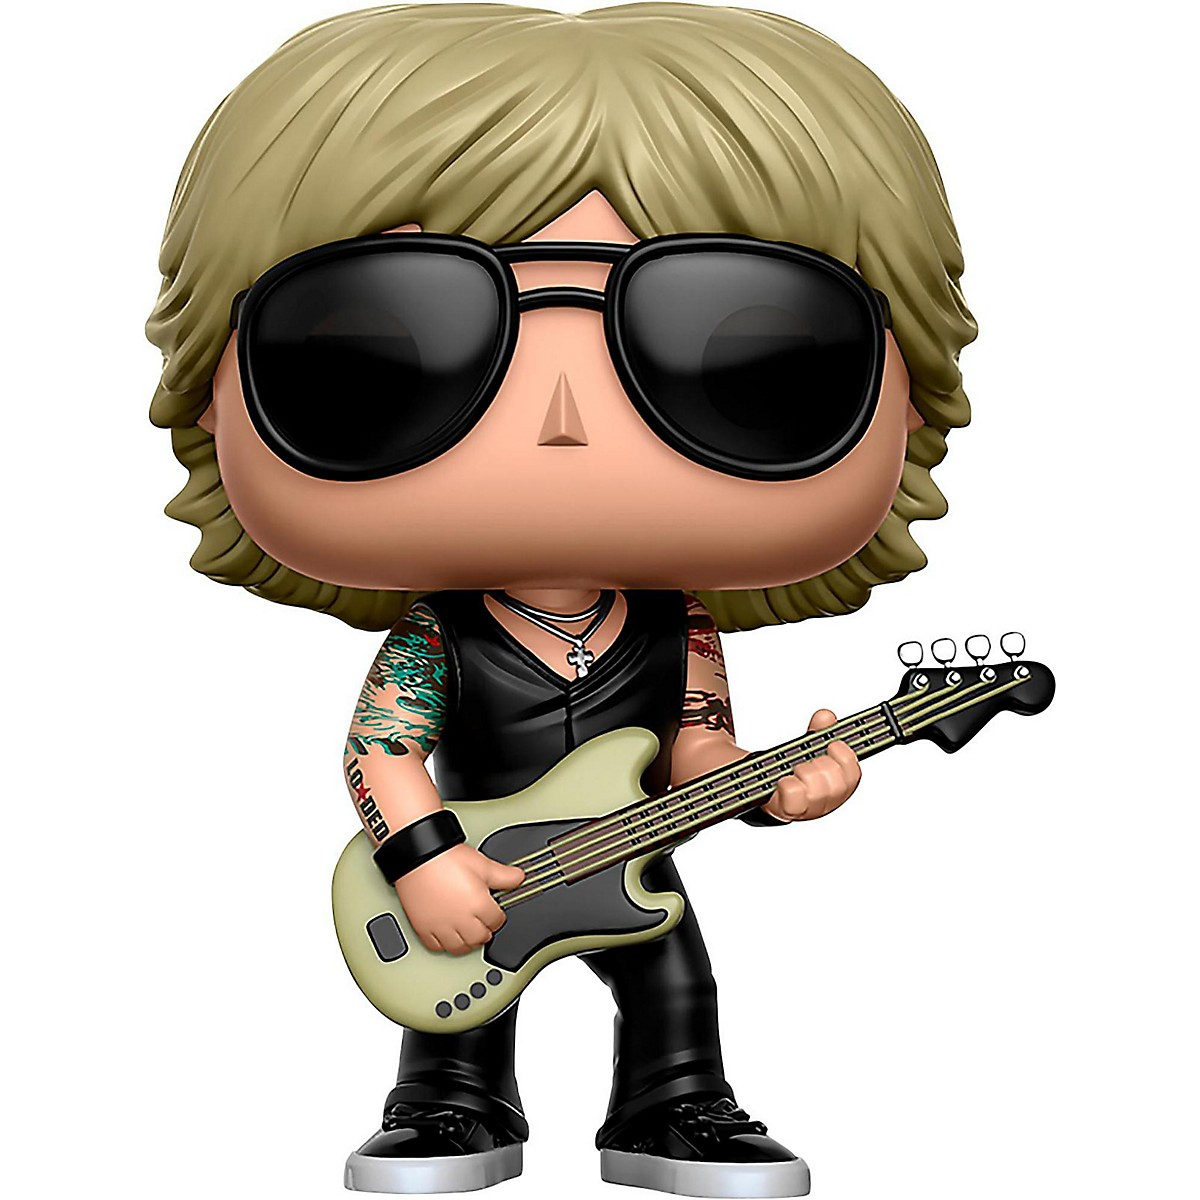 Funko Guns N' Roses Duff Mckagan Pop! Vinyl Figure